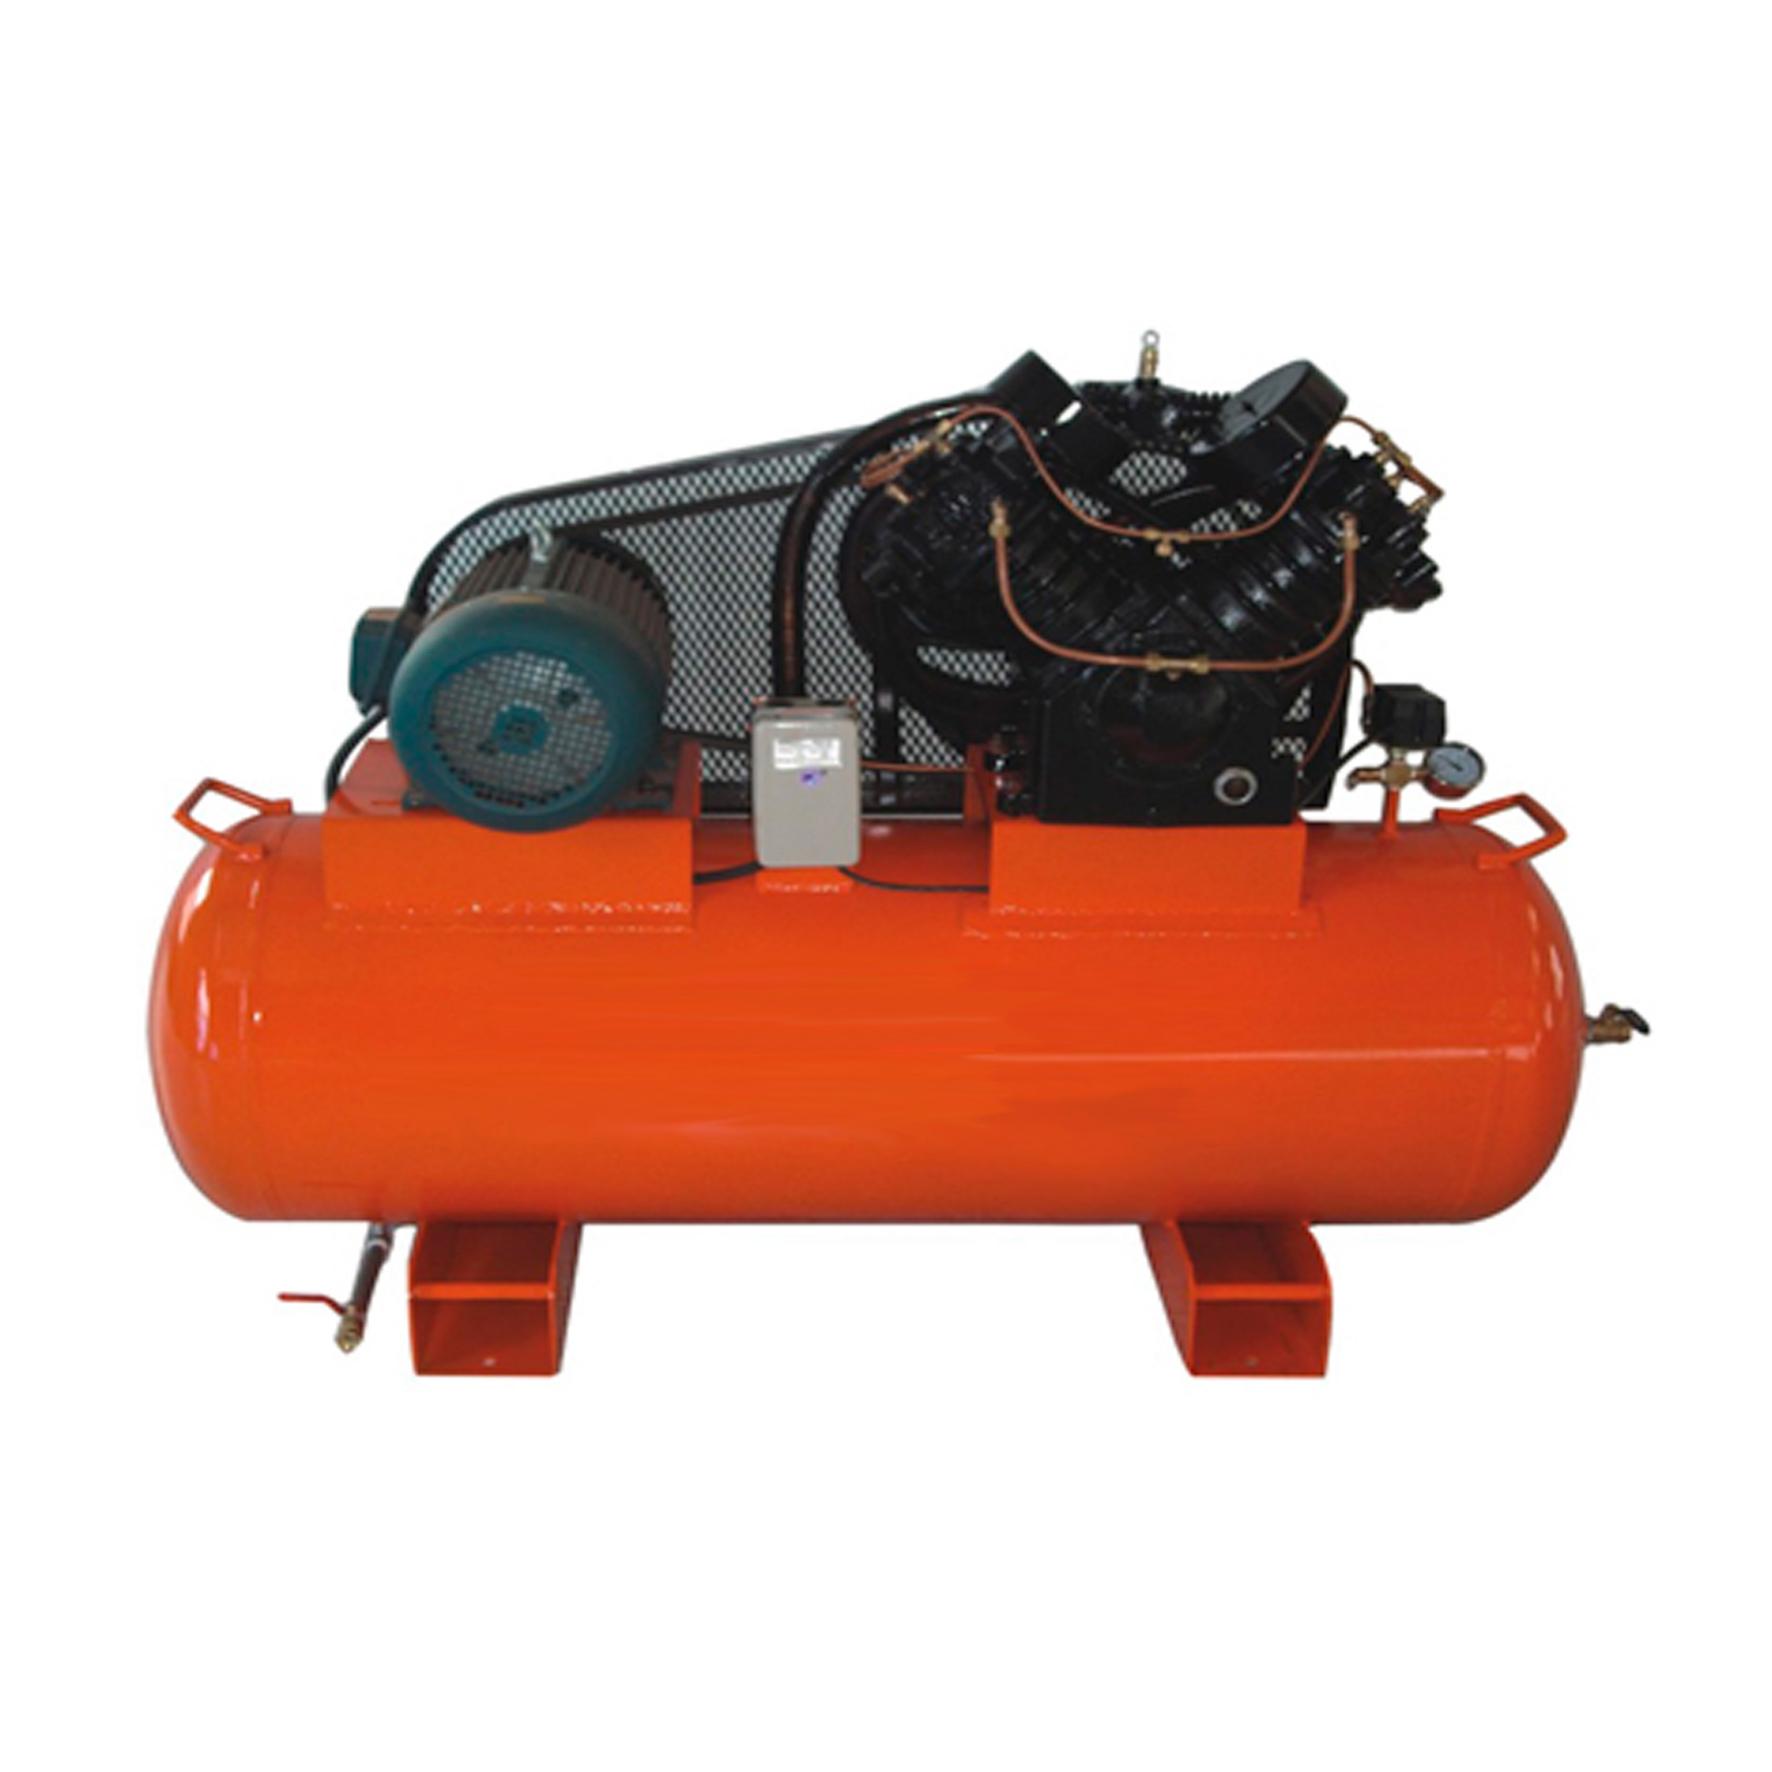 HDH15030 Air Compressor Machine Featured Image